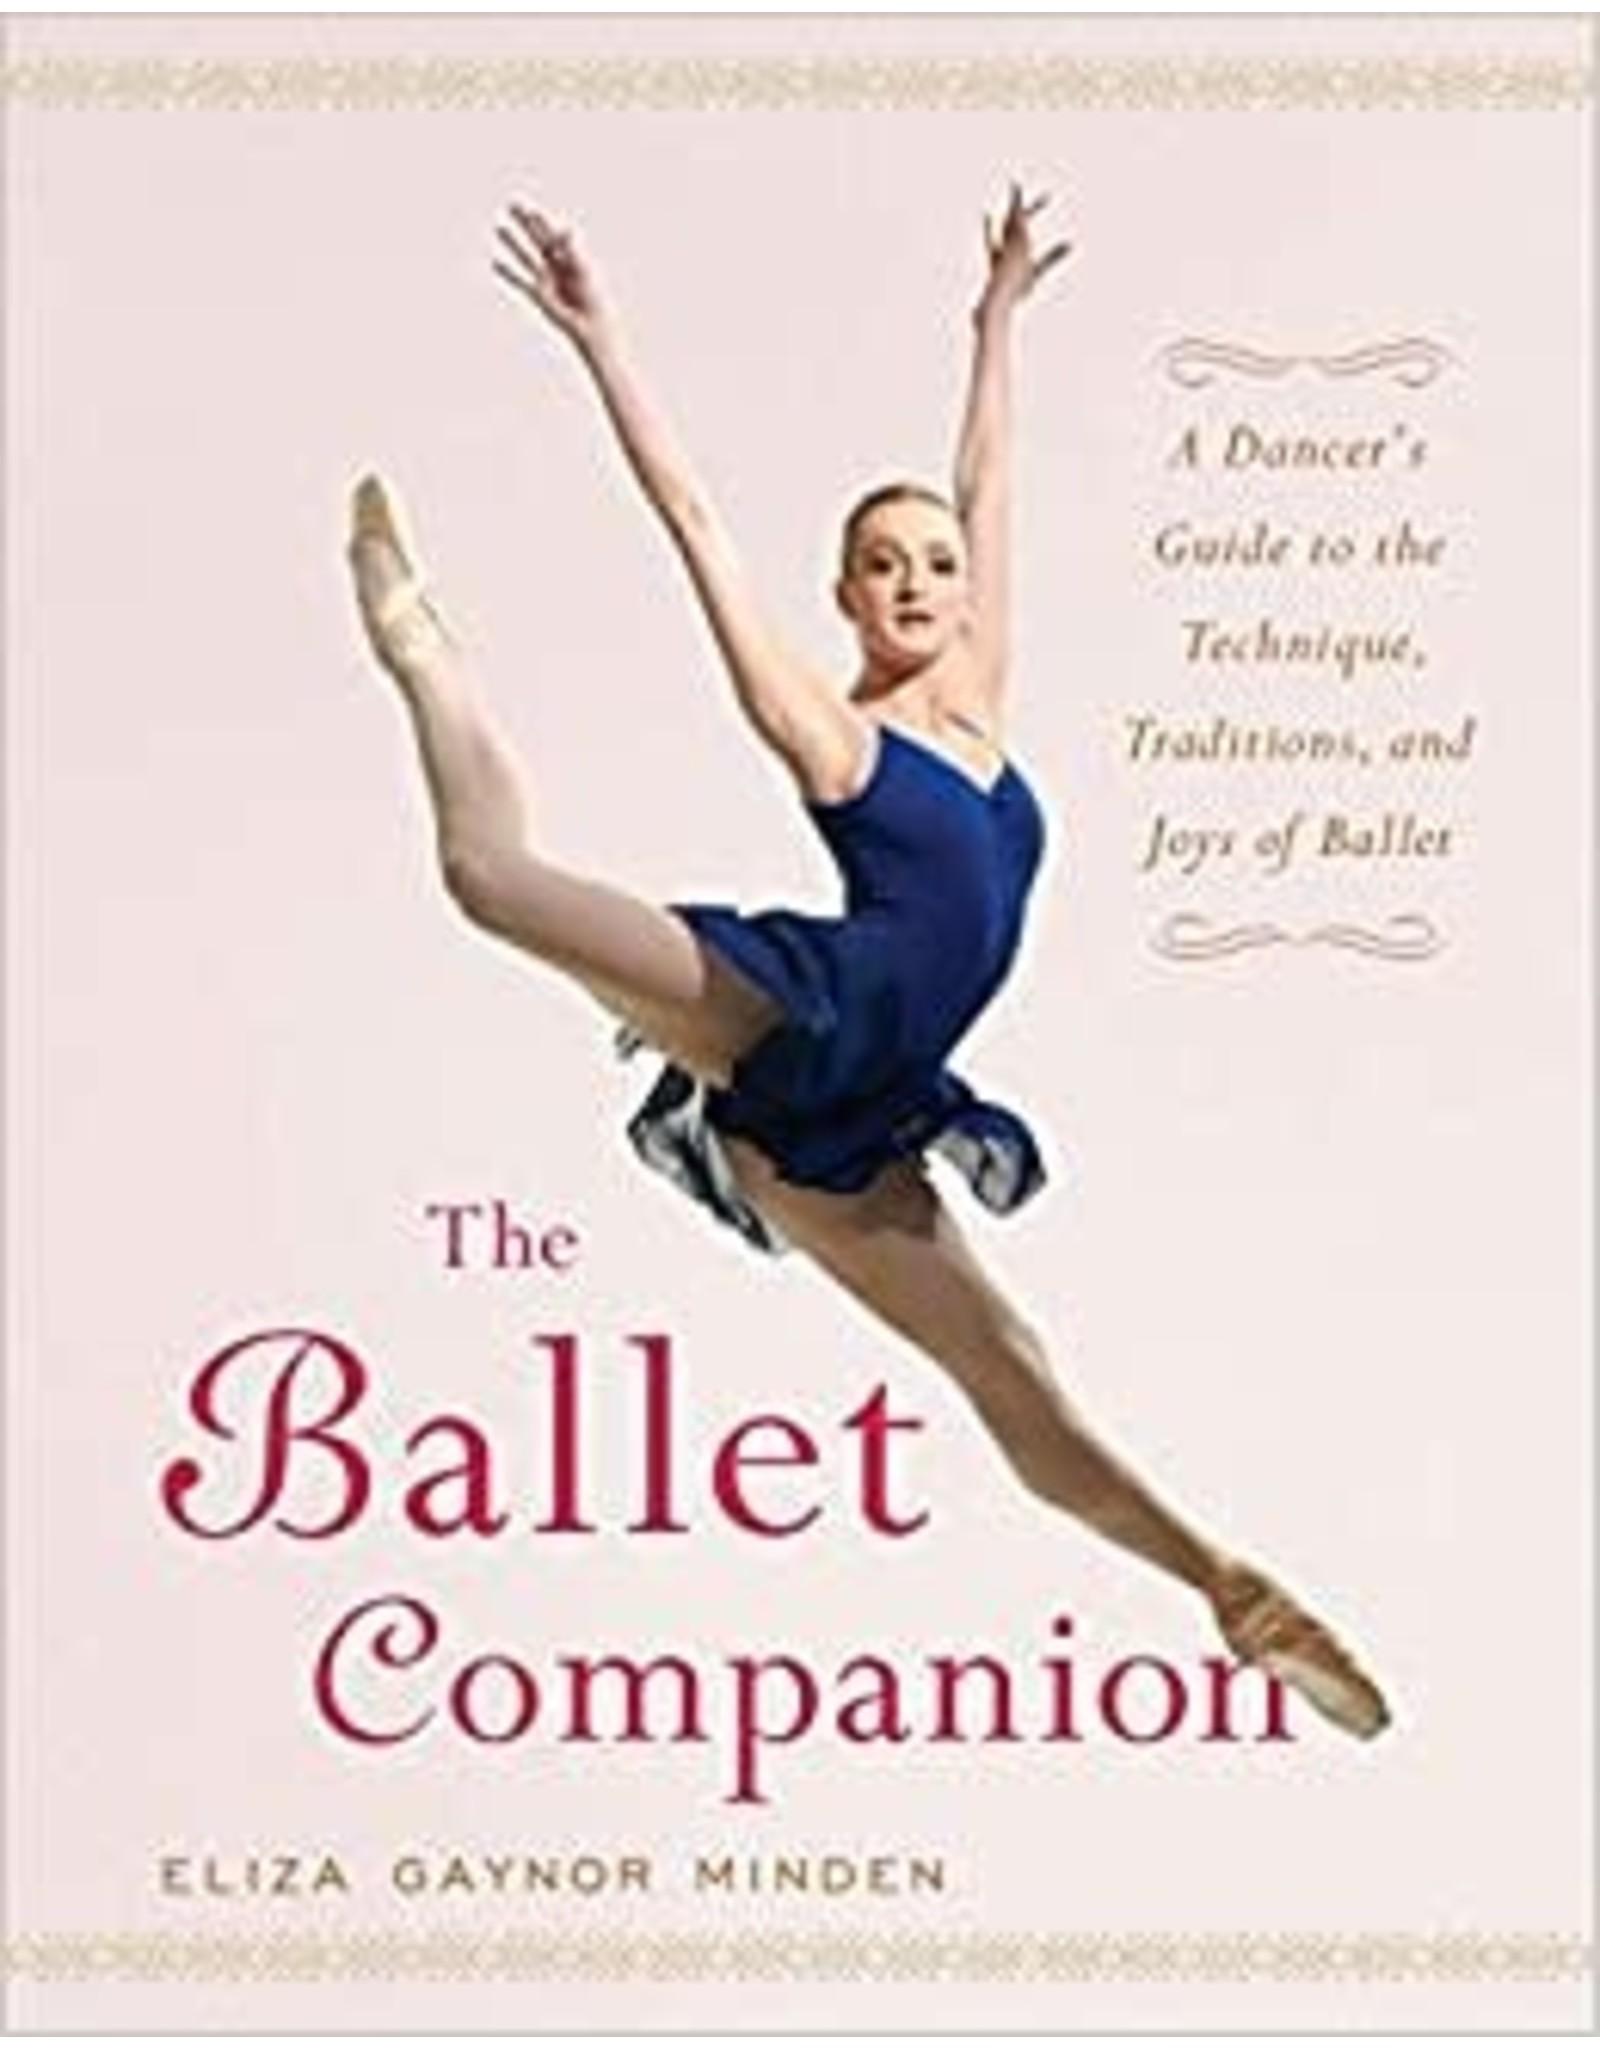 Gaynor Minden Gaynor minden Ballet Companion Book